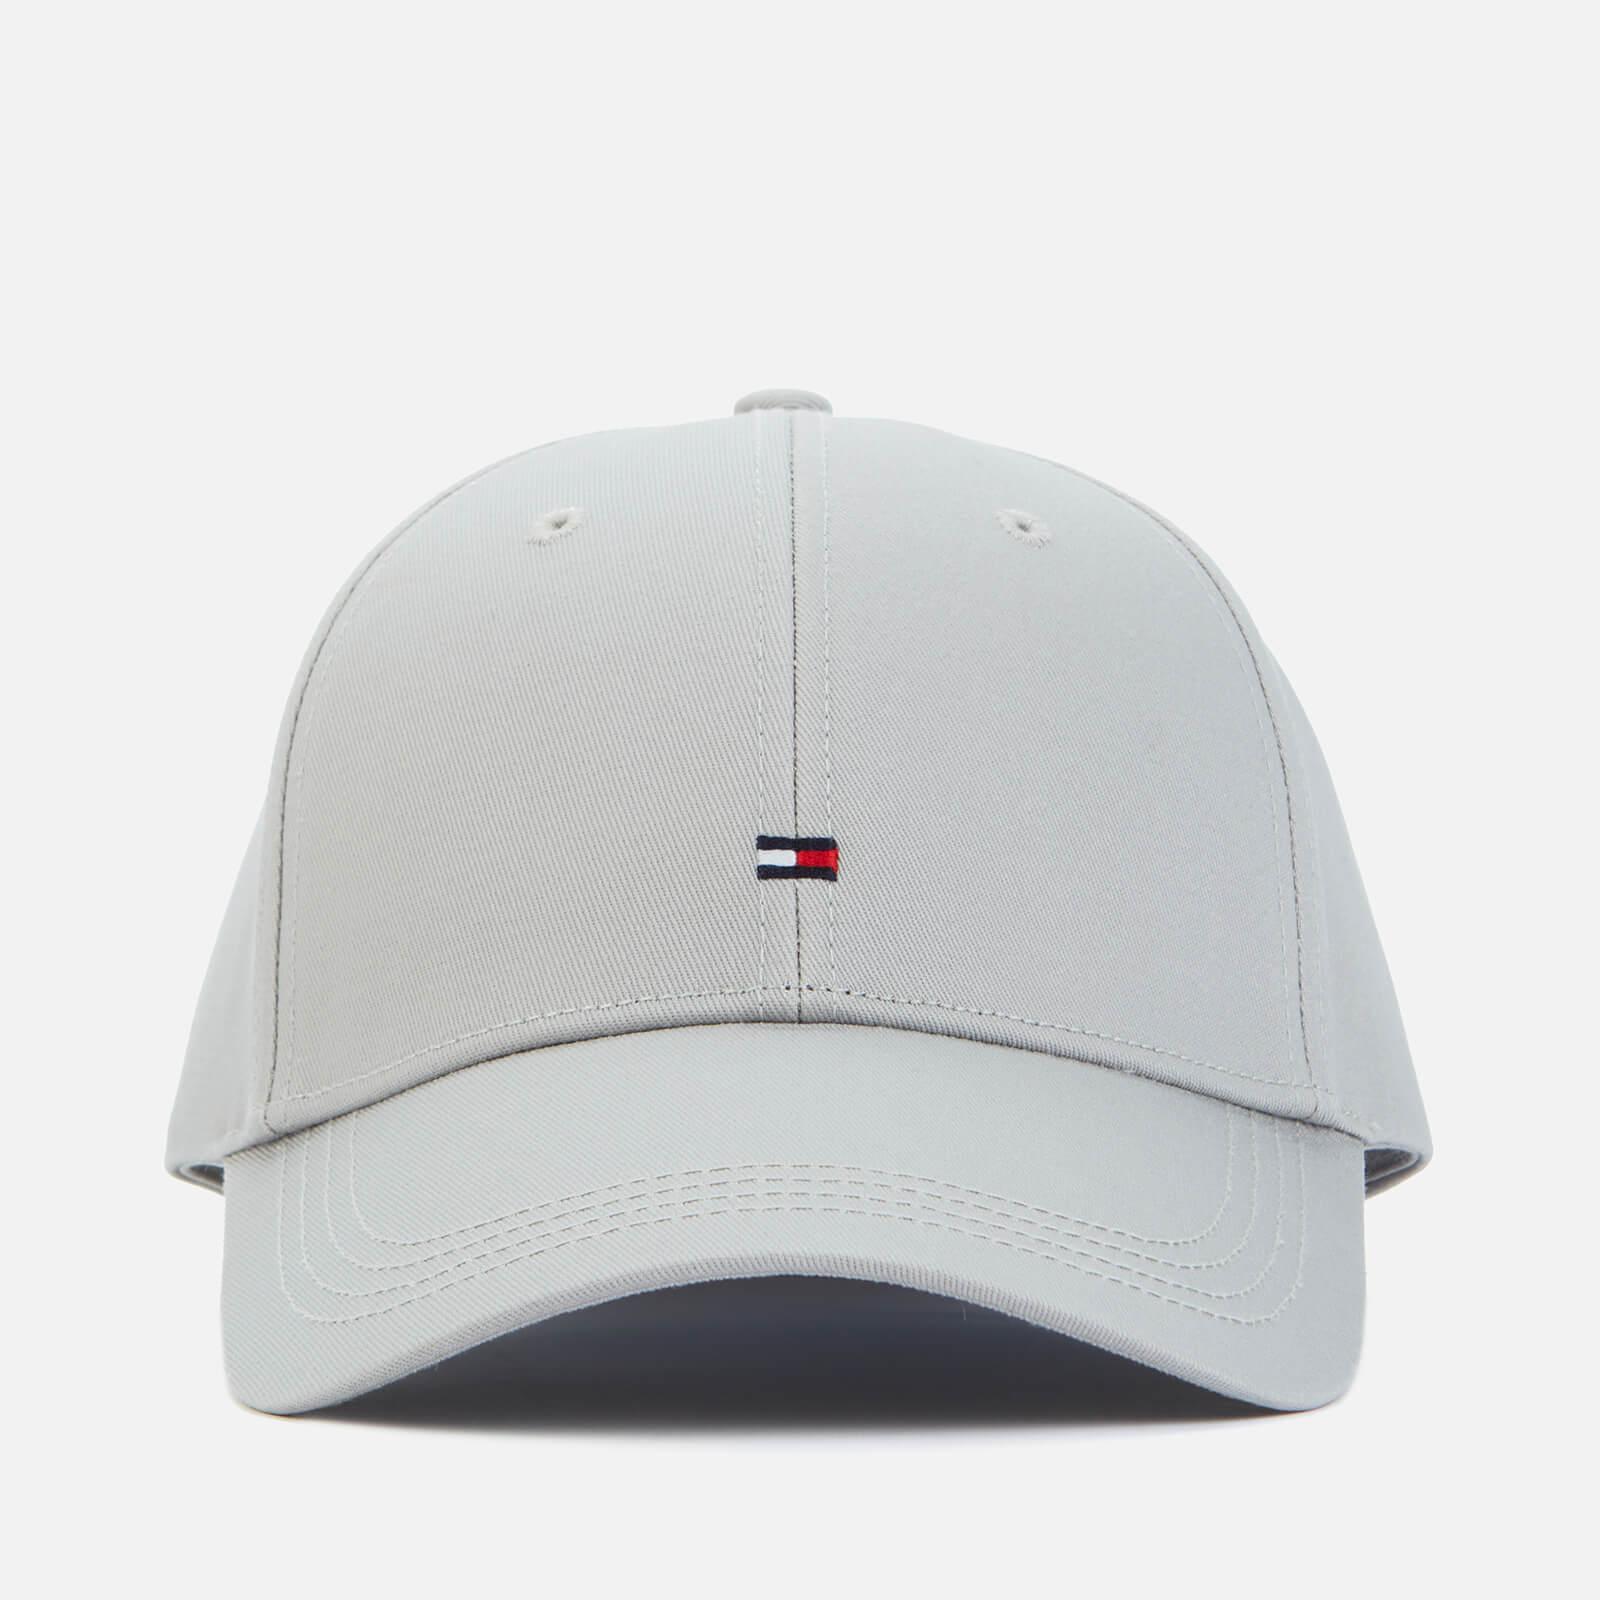 Tommy Hilfiger Men's Classic Baseball Cap - Drizzle Grey